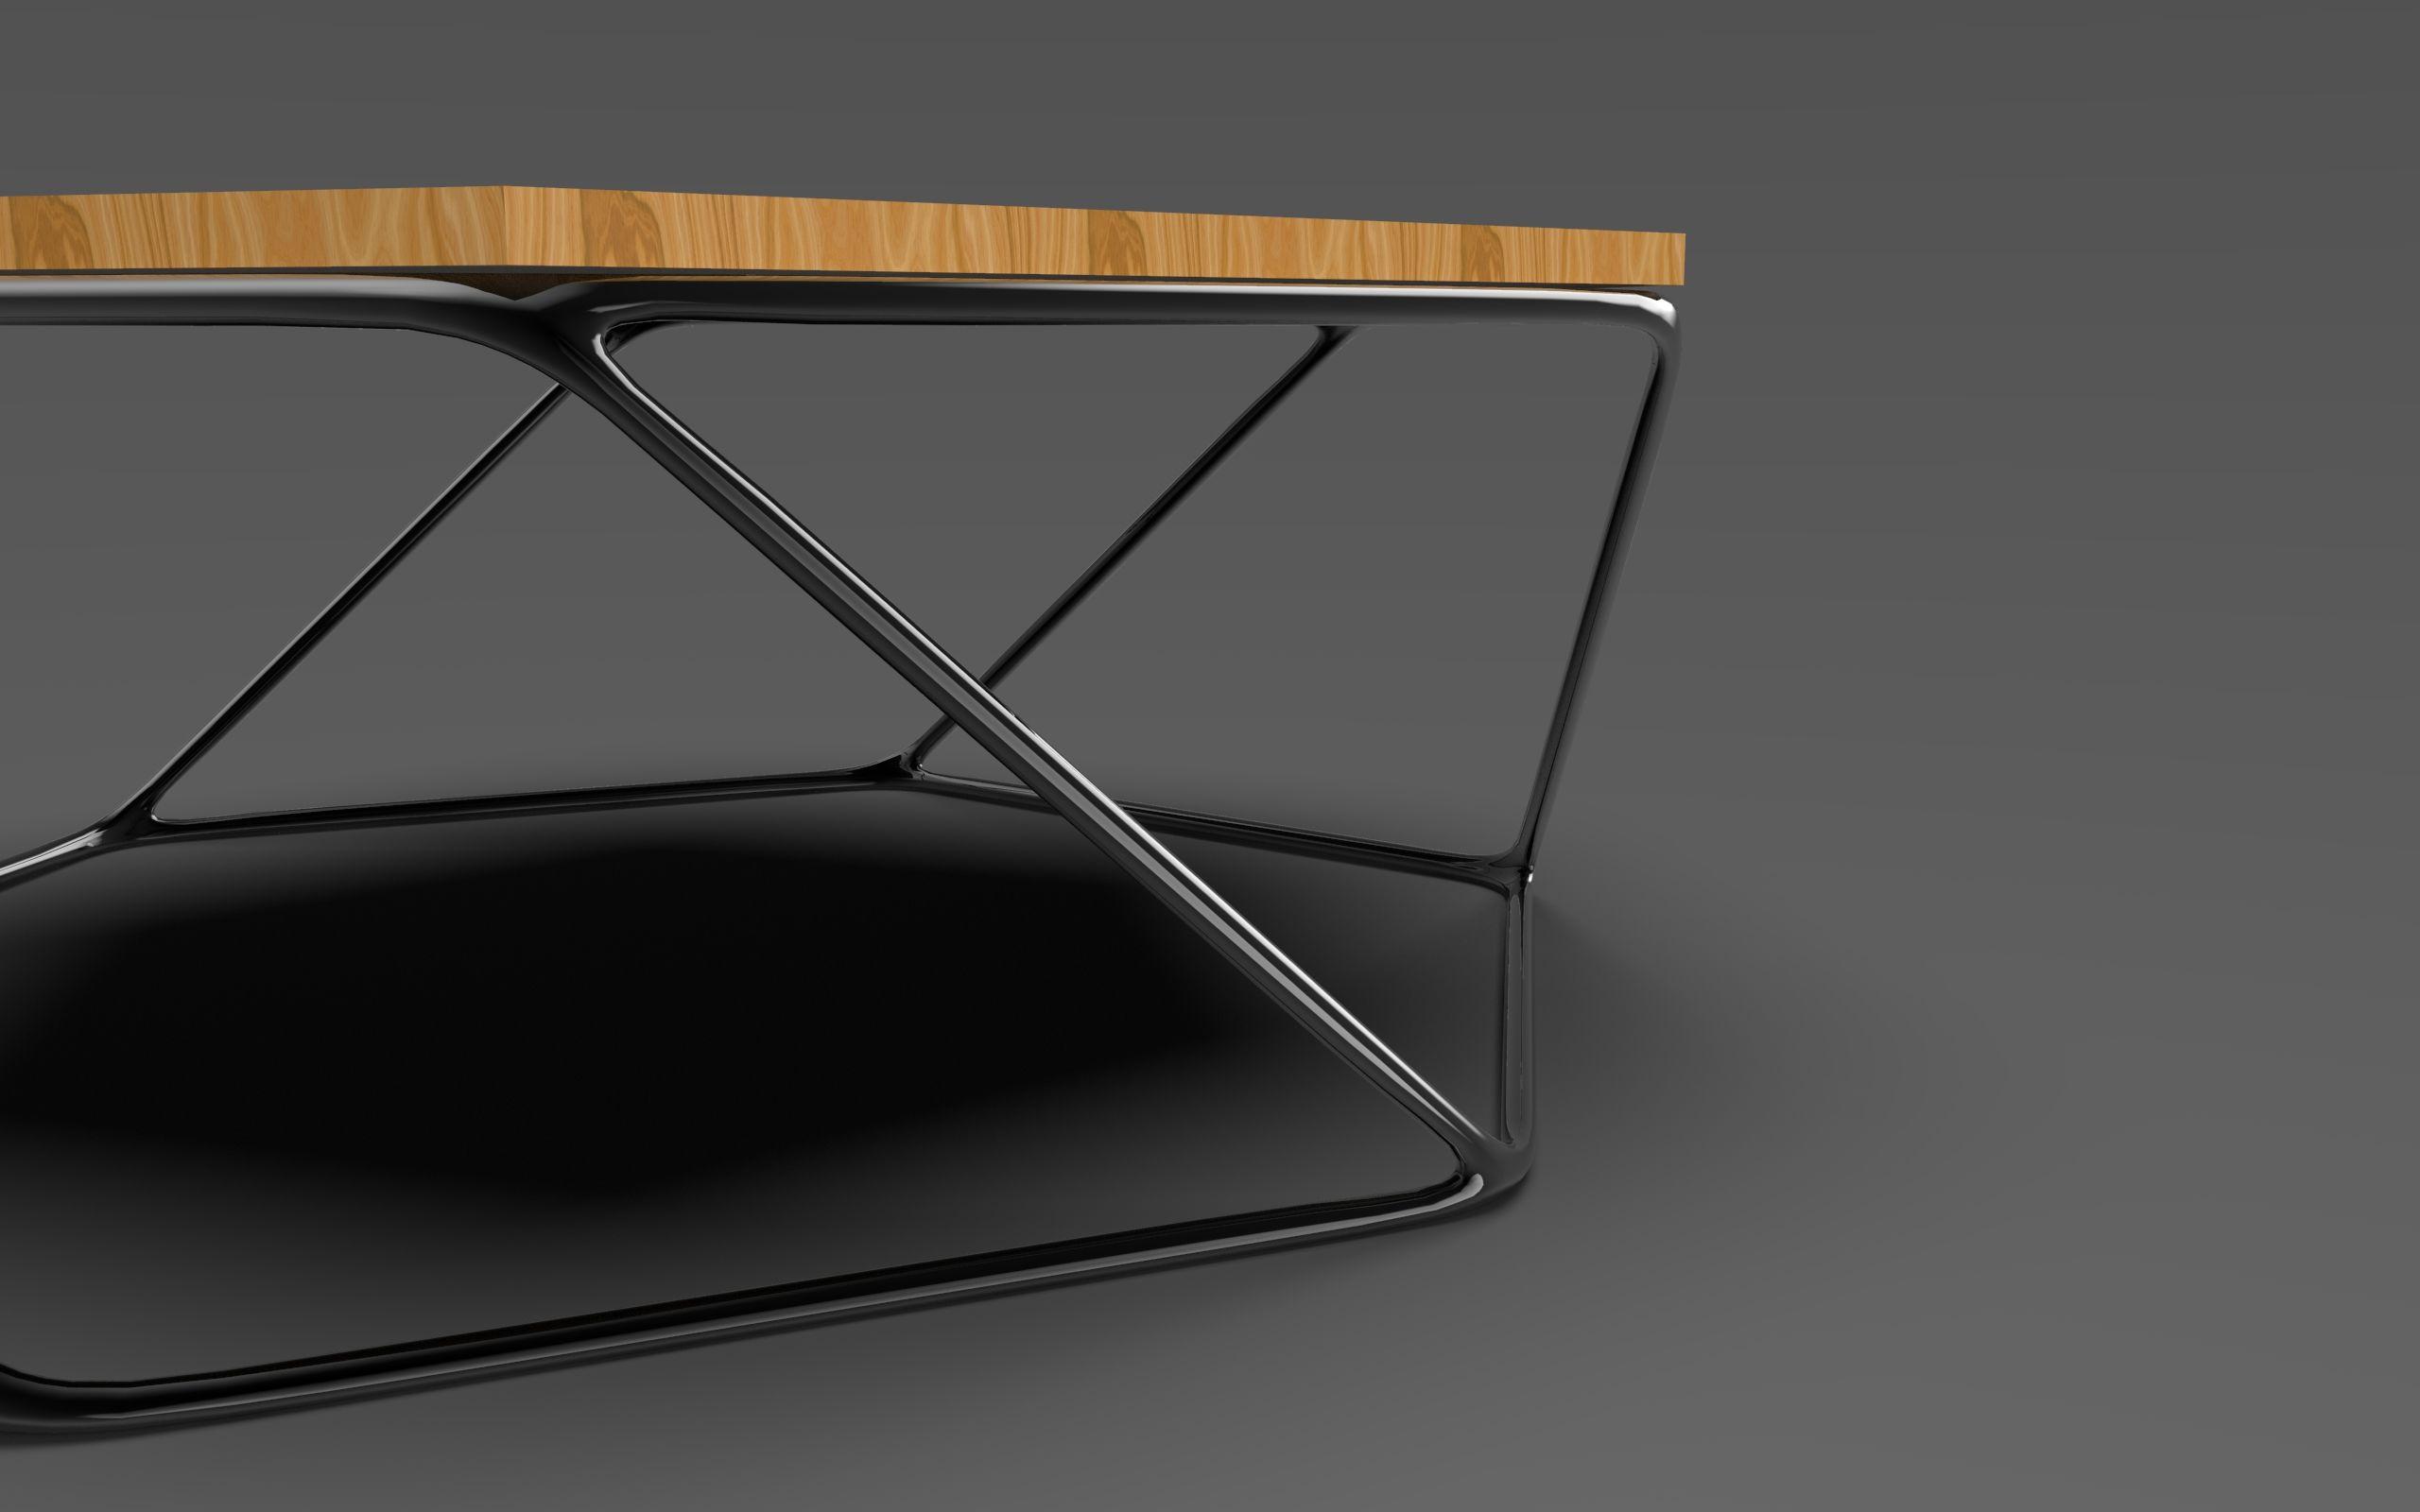 Coffee-table-ideas---fabrica-de-nerdes-lcs194-3500-3500